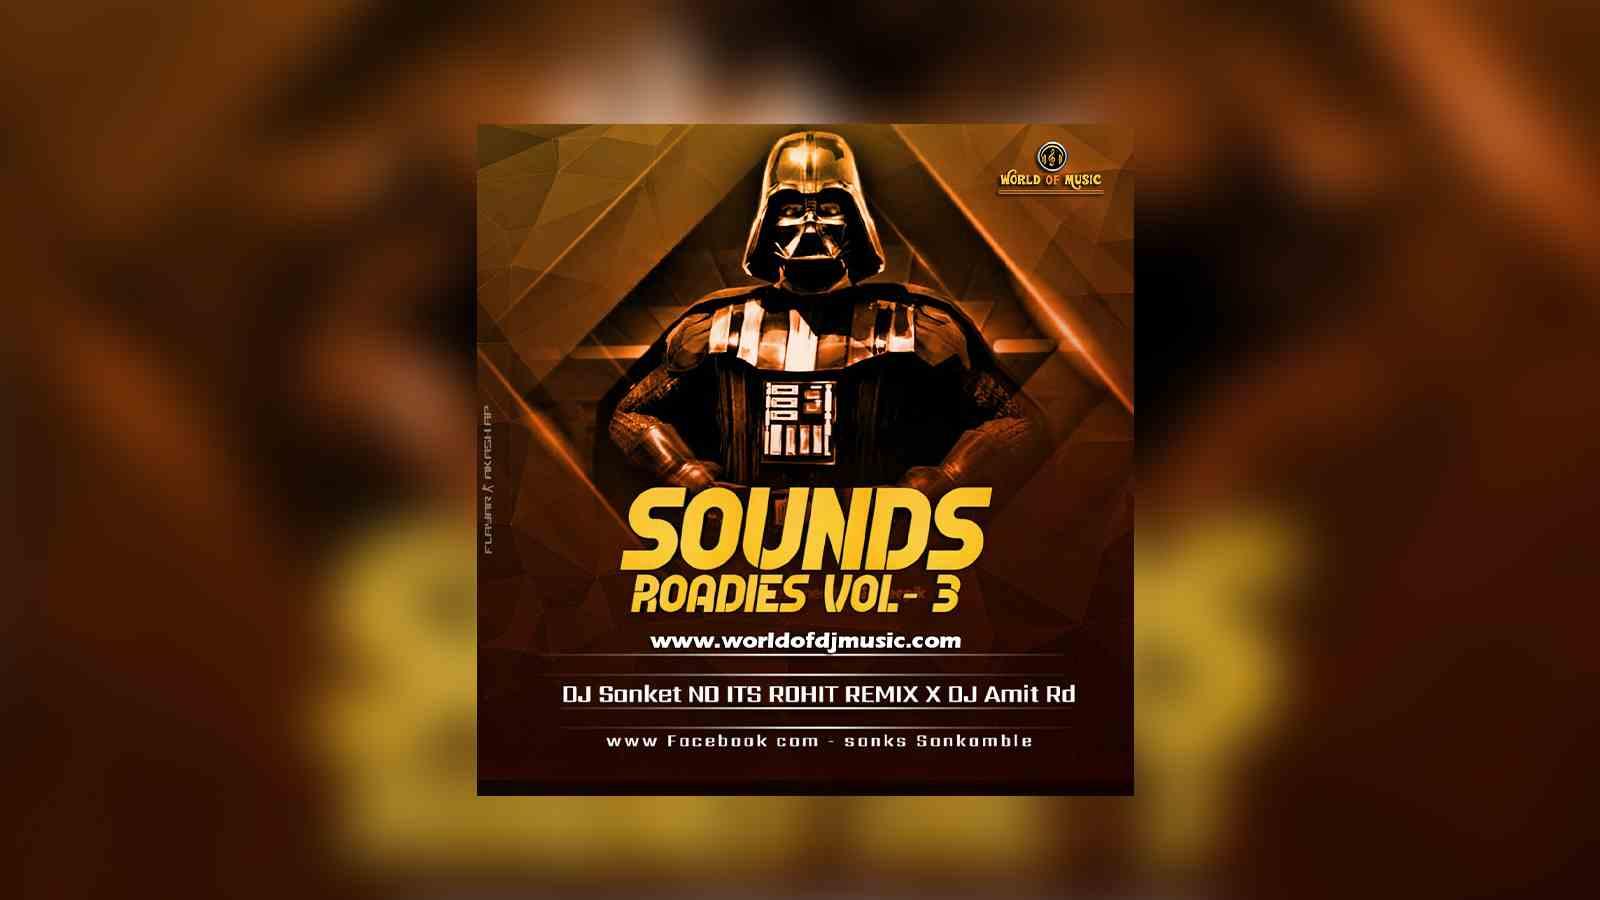 Tum To Dhokebazz Ho (Remix) - Dj Sanket ND Its Rohit Remix X Amit RD